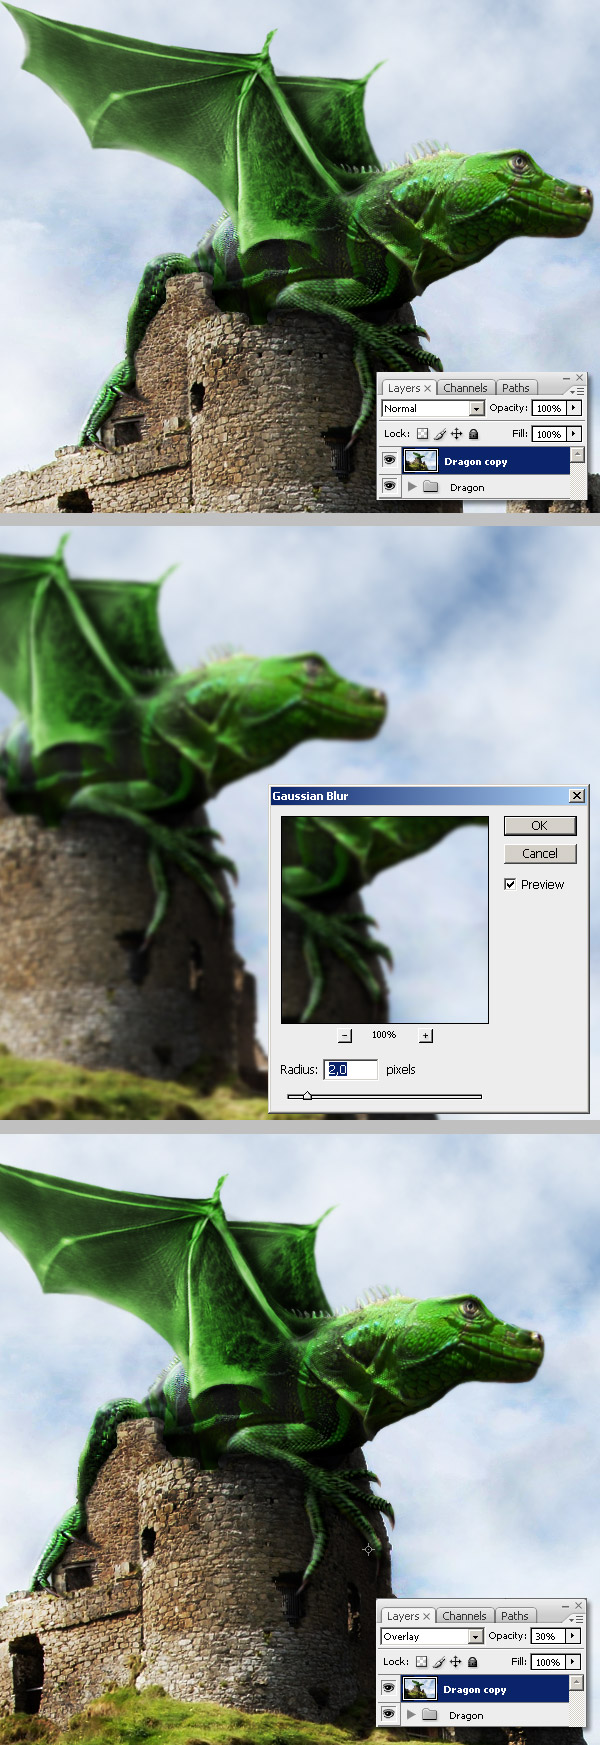 Photoshop图像合成实例:栩栩如生的翼龙_亿码酷站___亿码酷站平面设计教程插图20